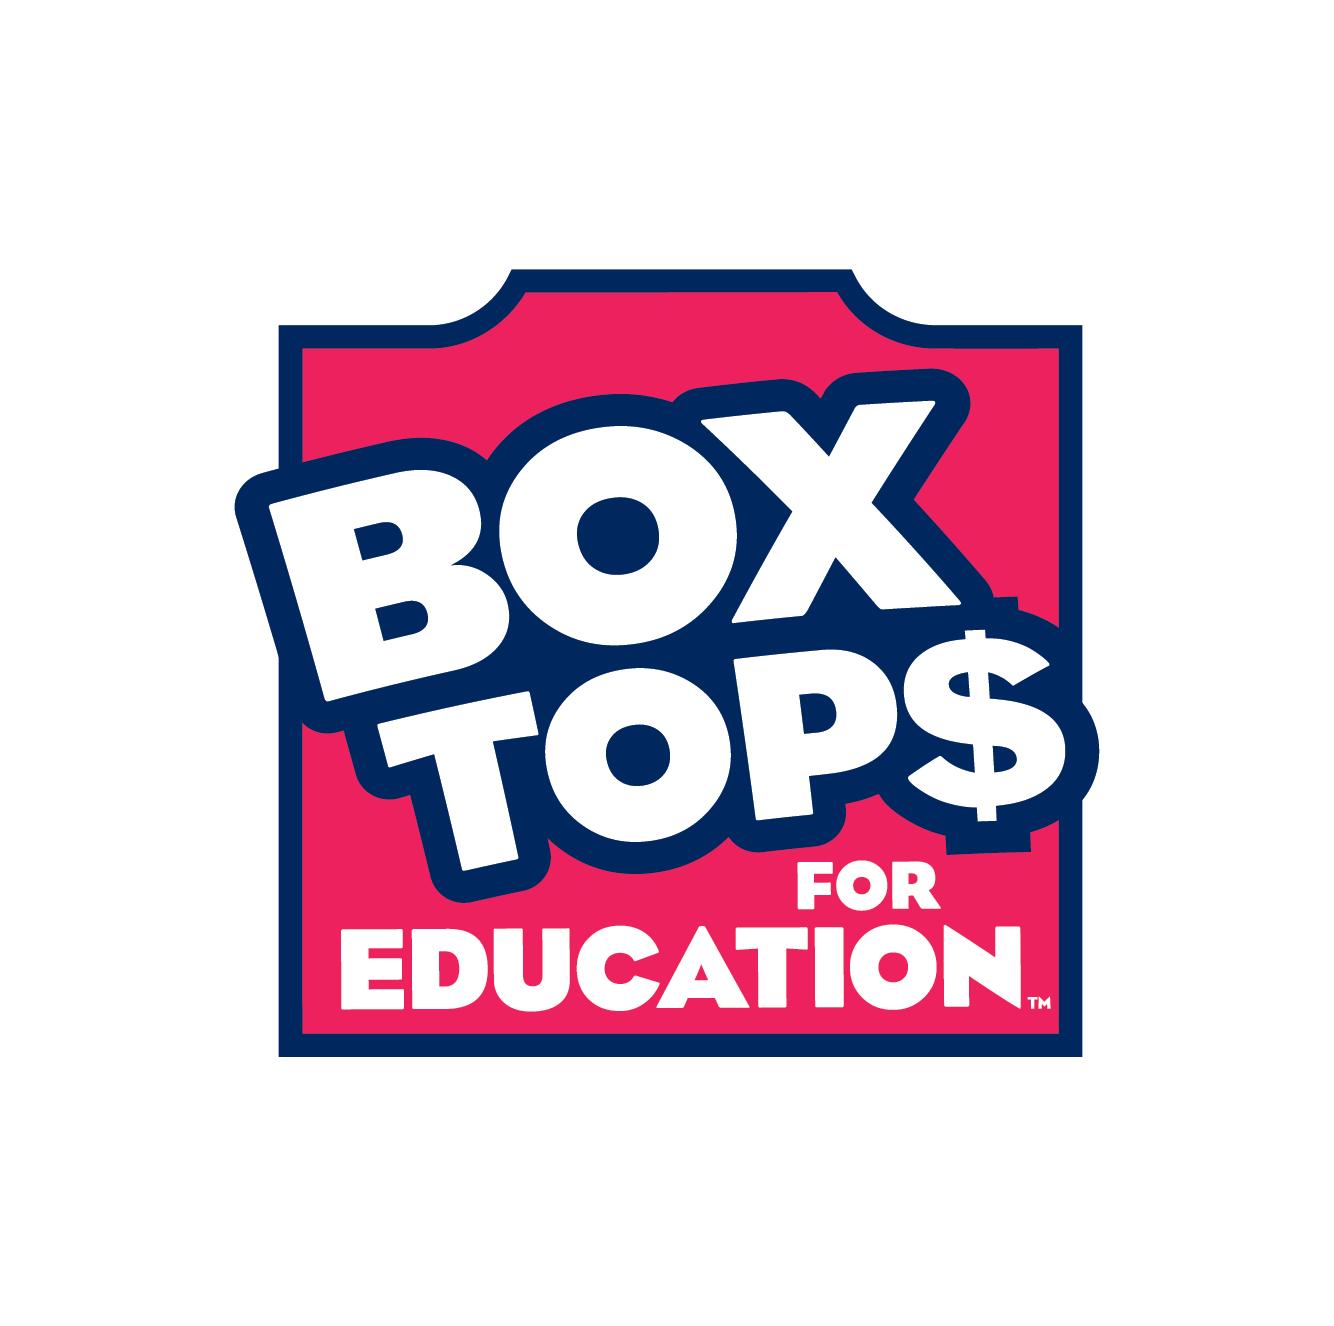 box tops Home2020 v2